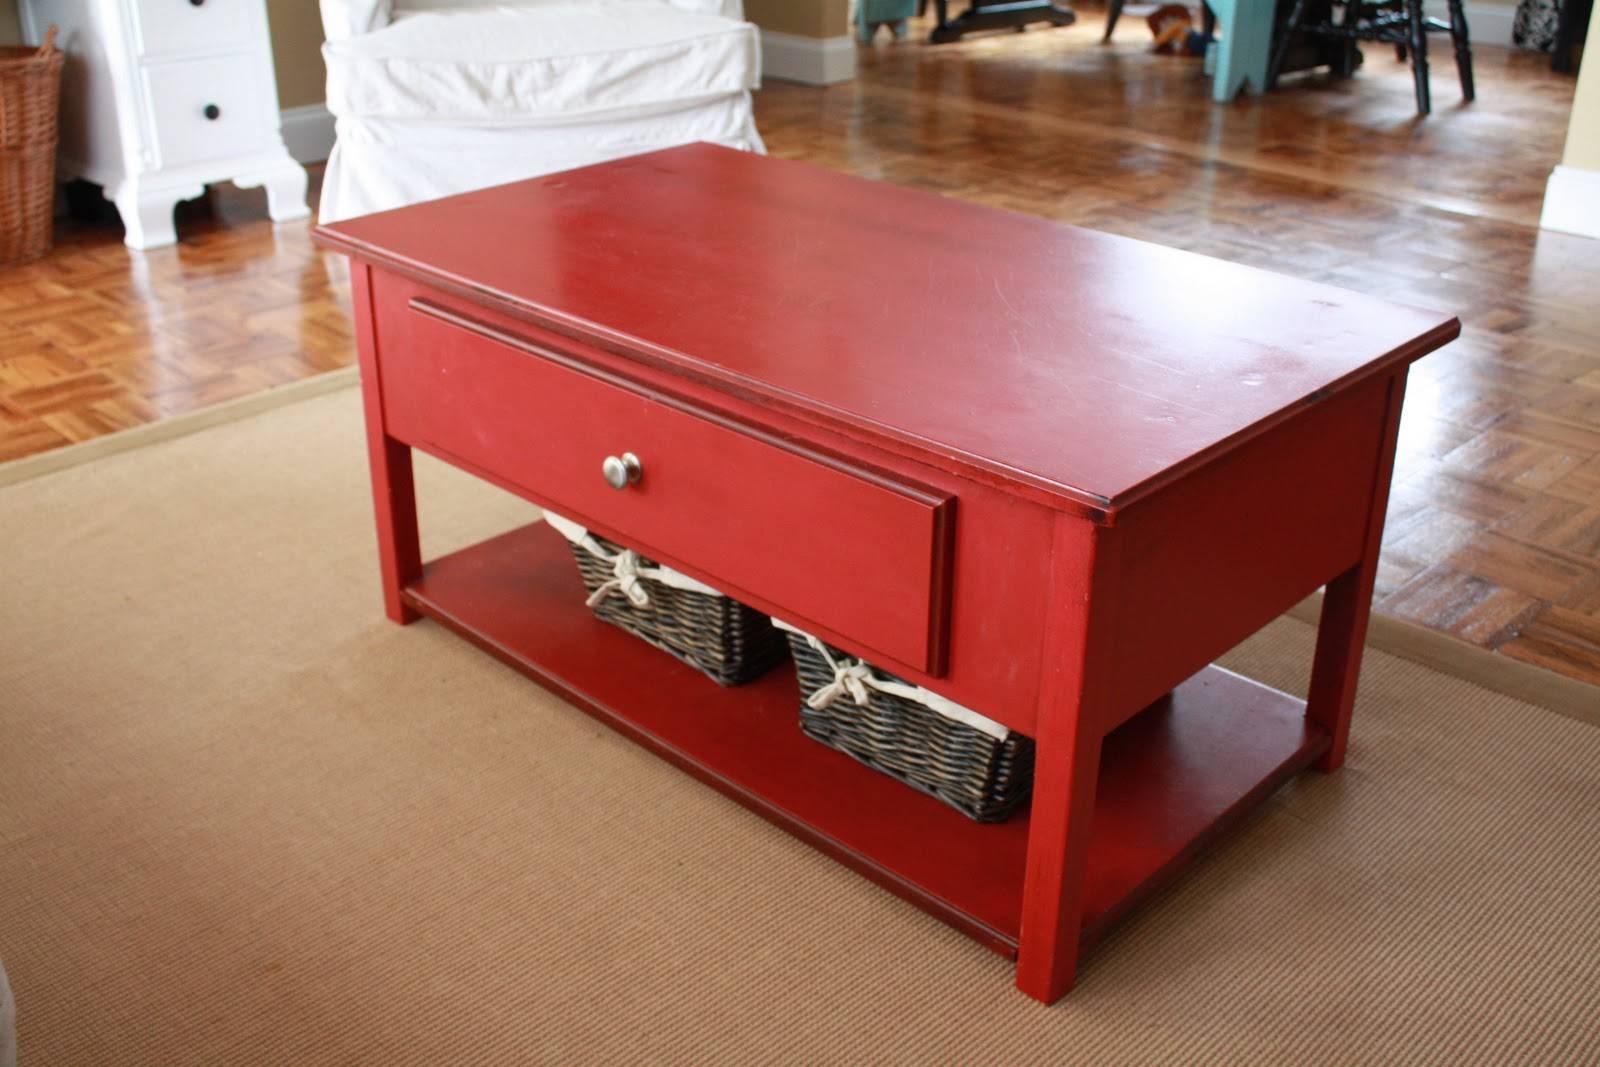 Extraordinary Red Coffee Table Ideas – Wayfair Red Coffee Table regarding Red Coffee Table (Image 12 of 30)